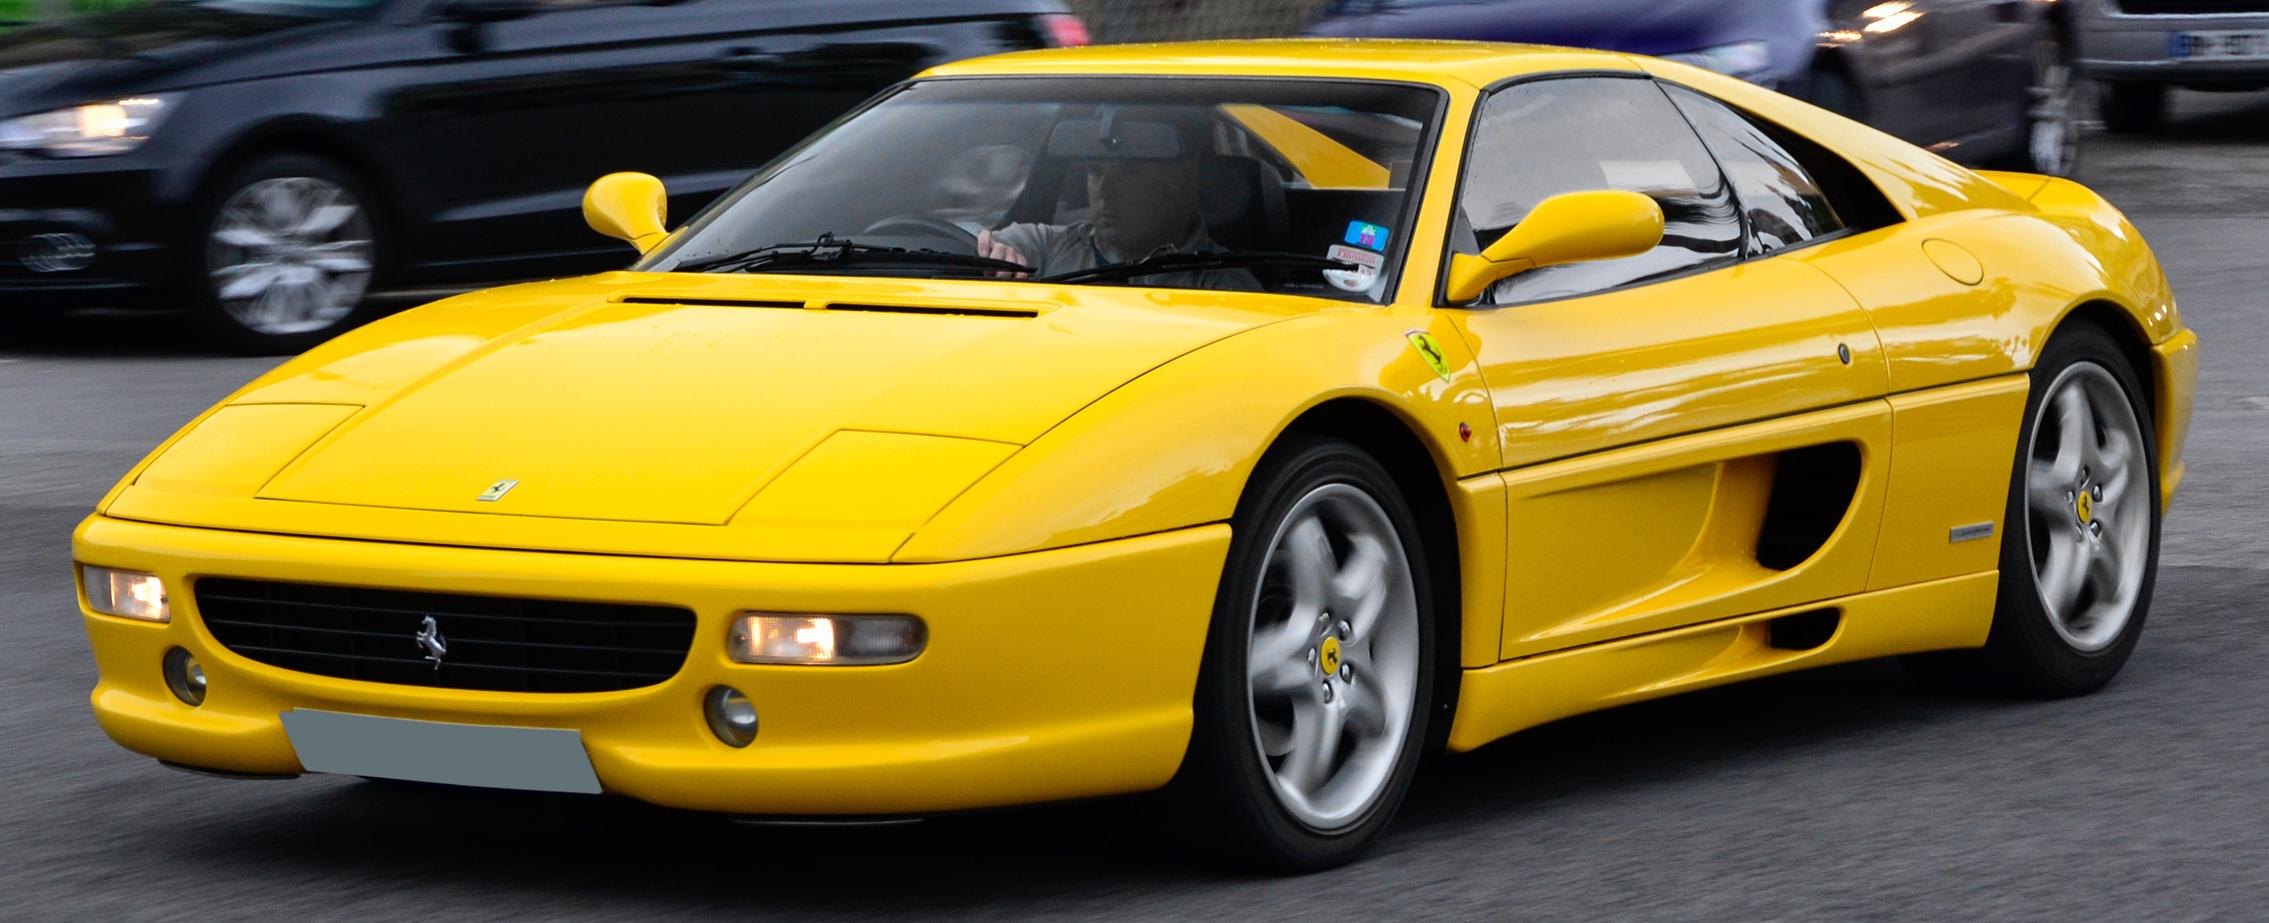 Ferrari_F355_%288735086047%29_%28cropped%29 Outstanding Ferrari Mondial 8 Sale south Africa Cars Trend